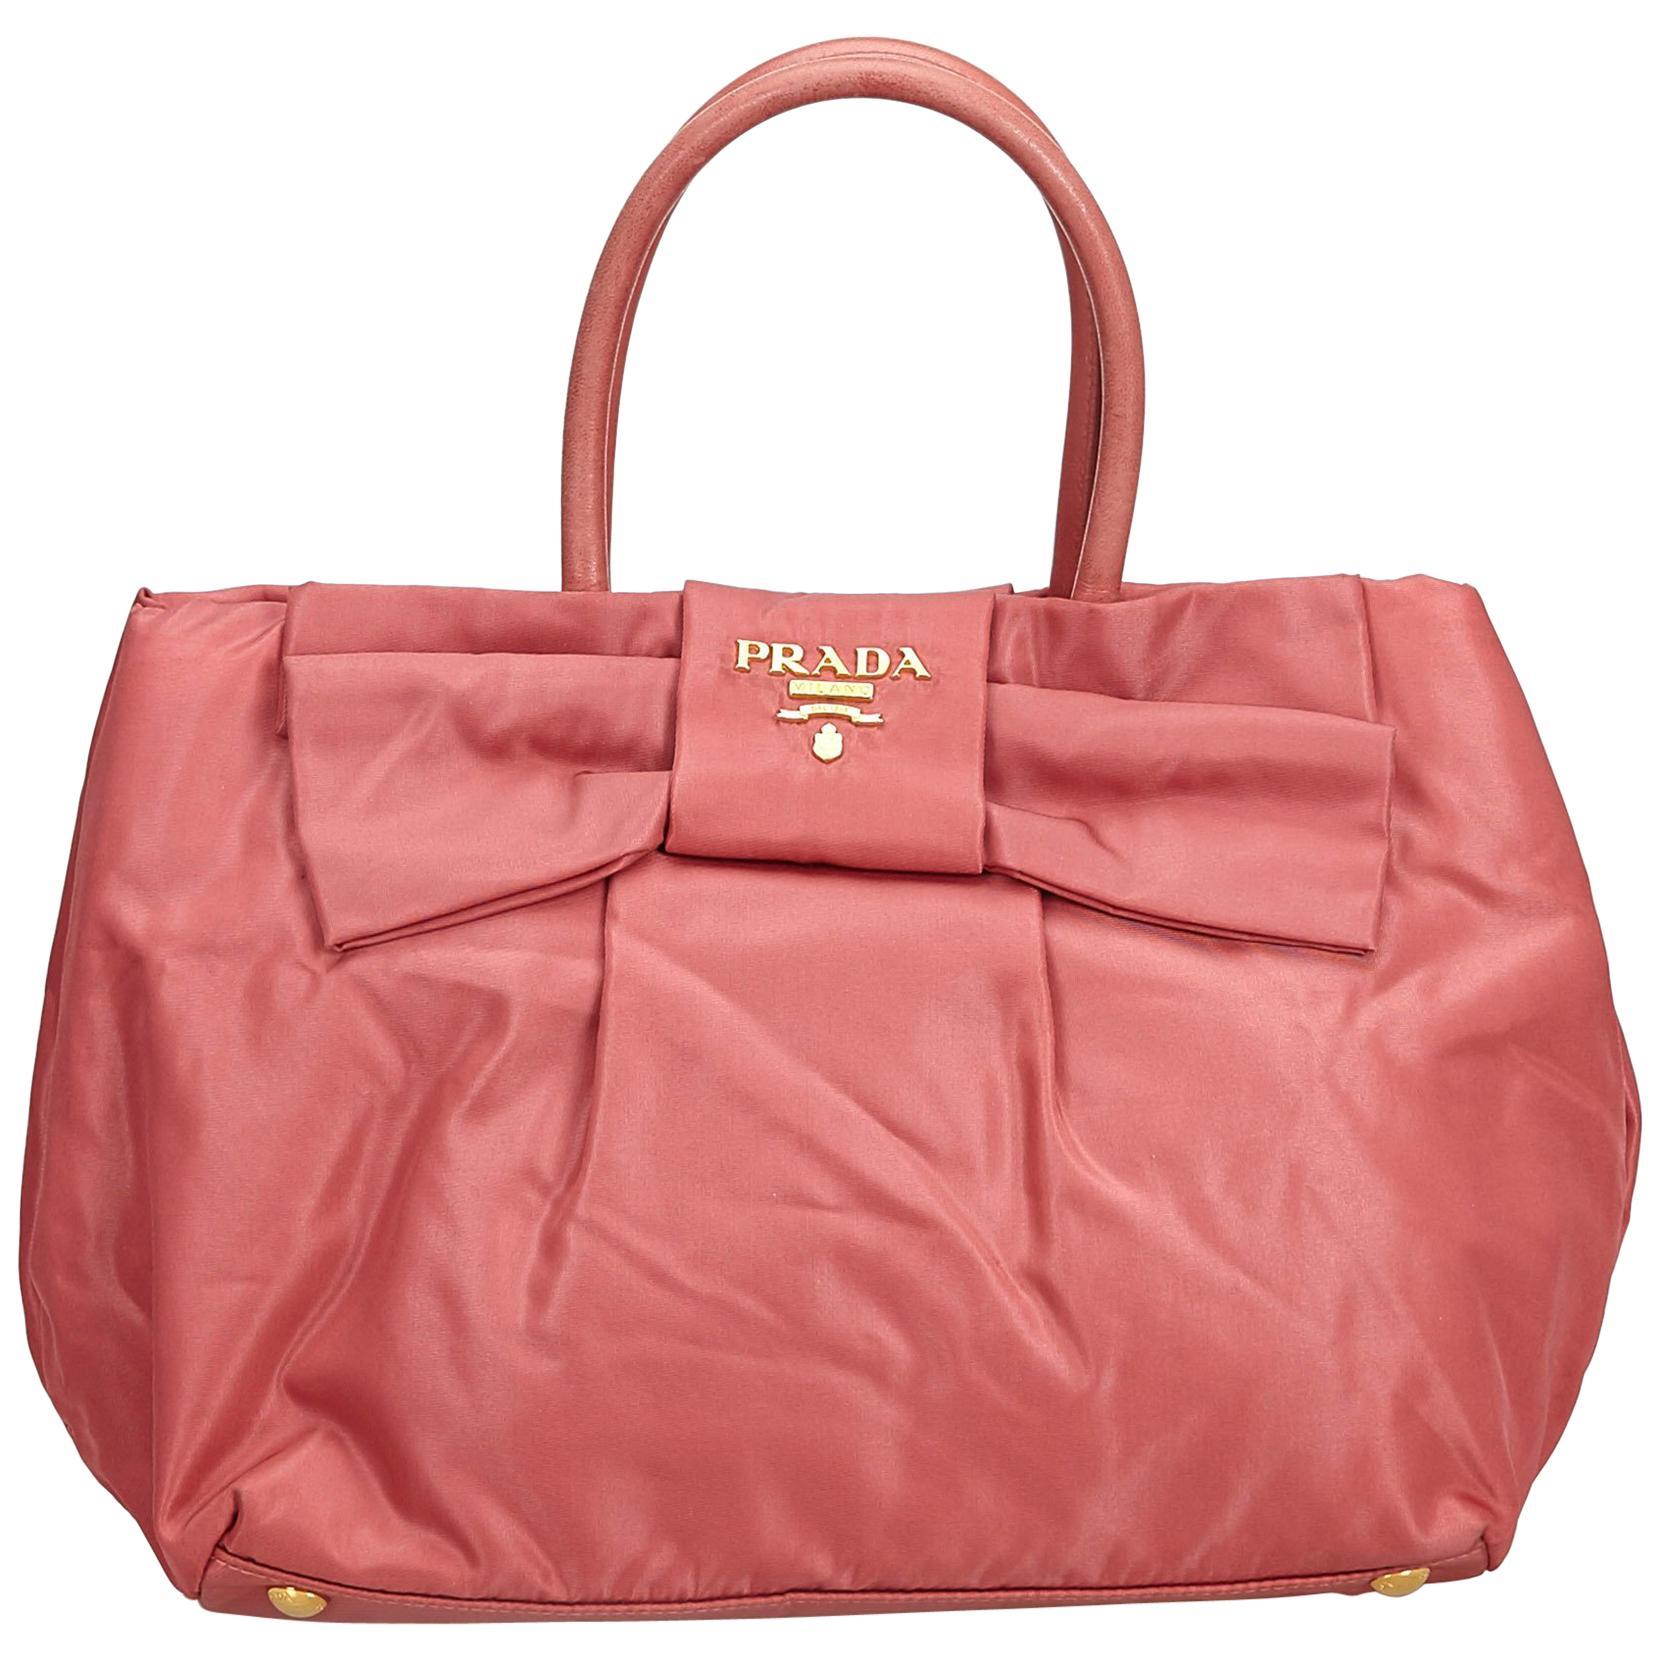 8e84f5405c8b Vintage Prada Top Handle Bags - 237 For Sale at 1stdibs